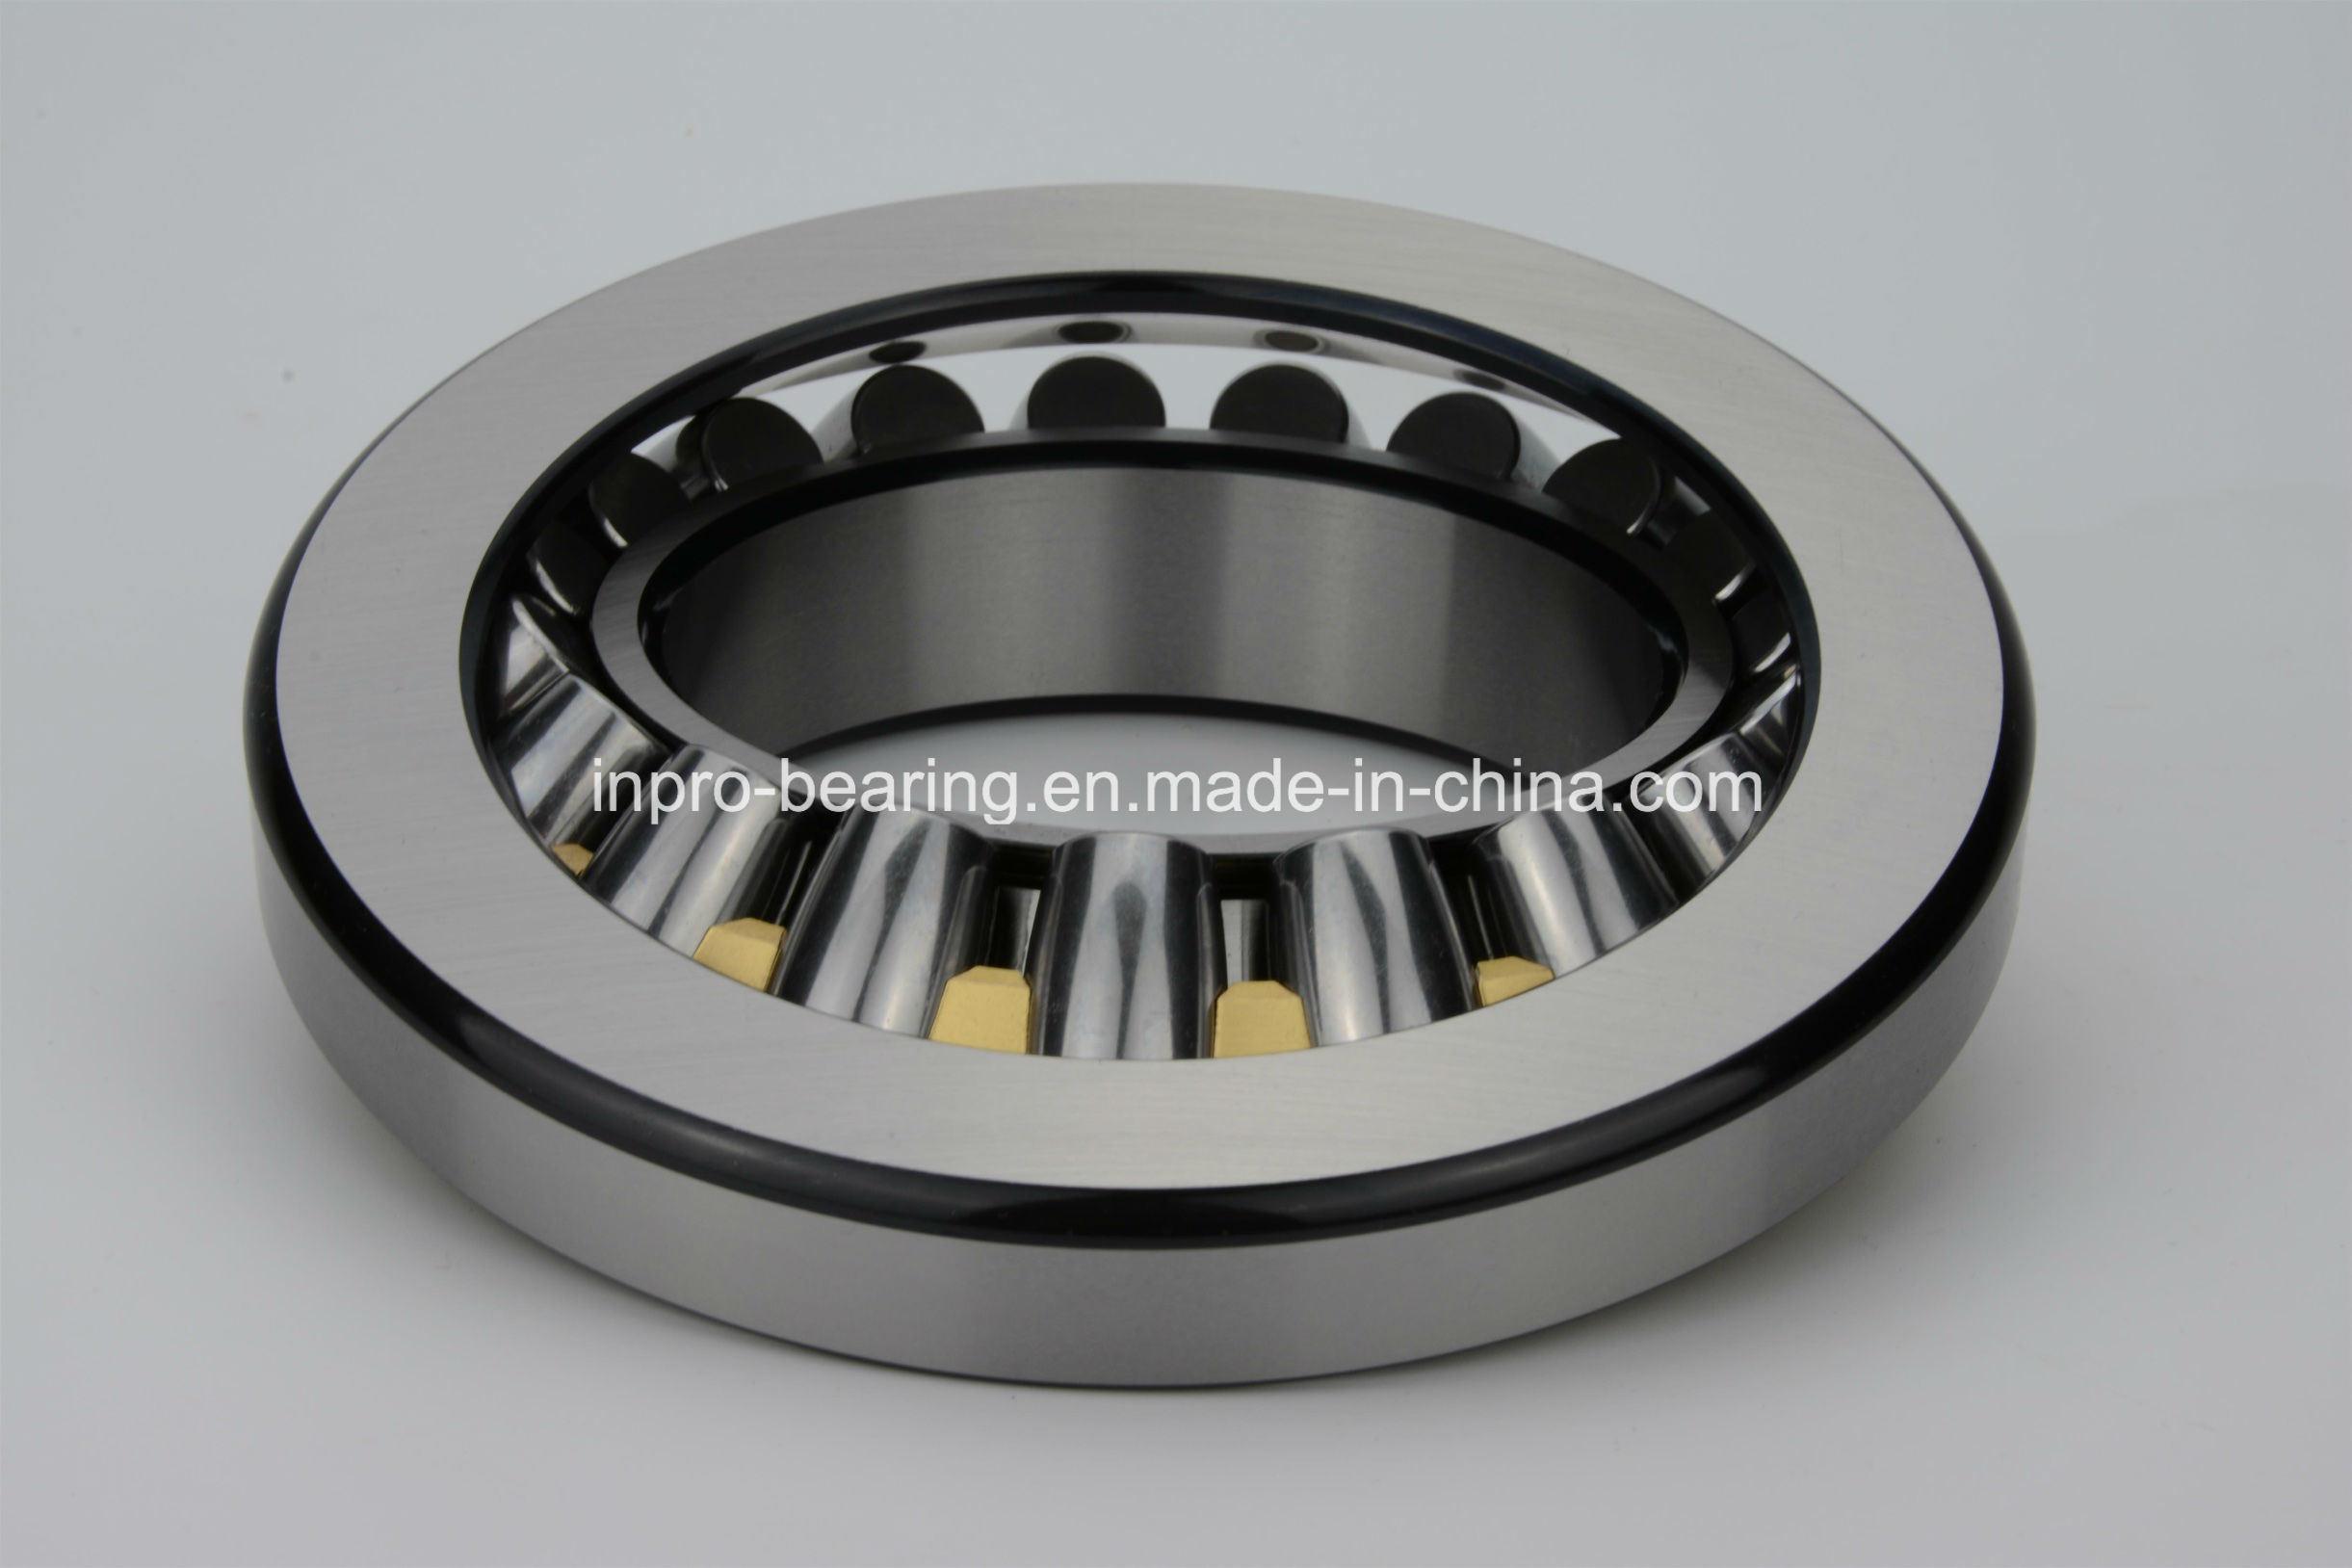 Stainless Steel Thrust Roller Bearing 81120, 81122, 81124, 81126